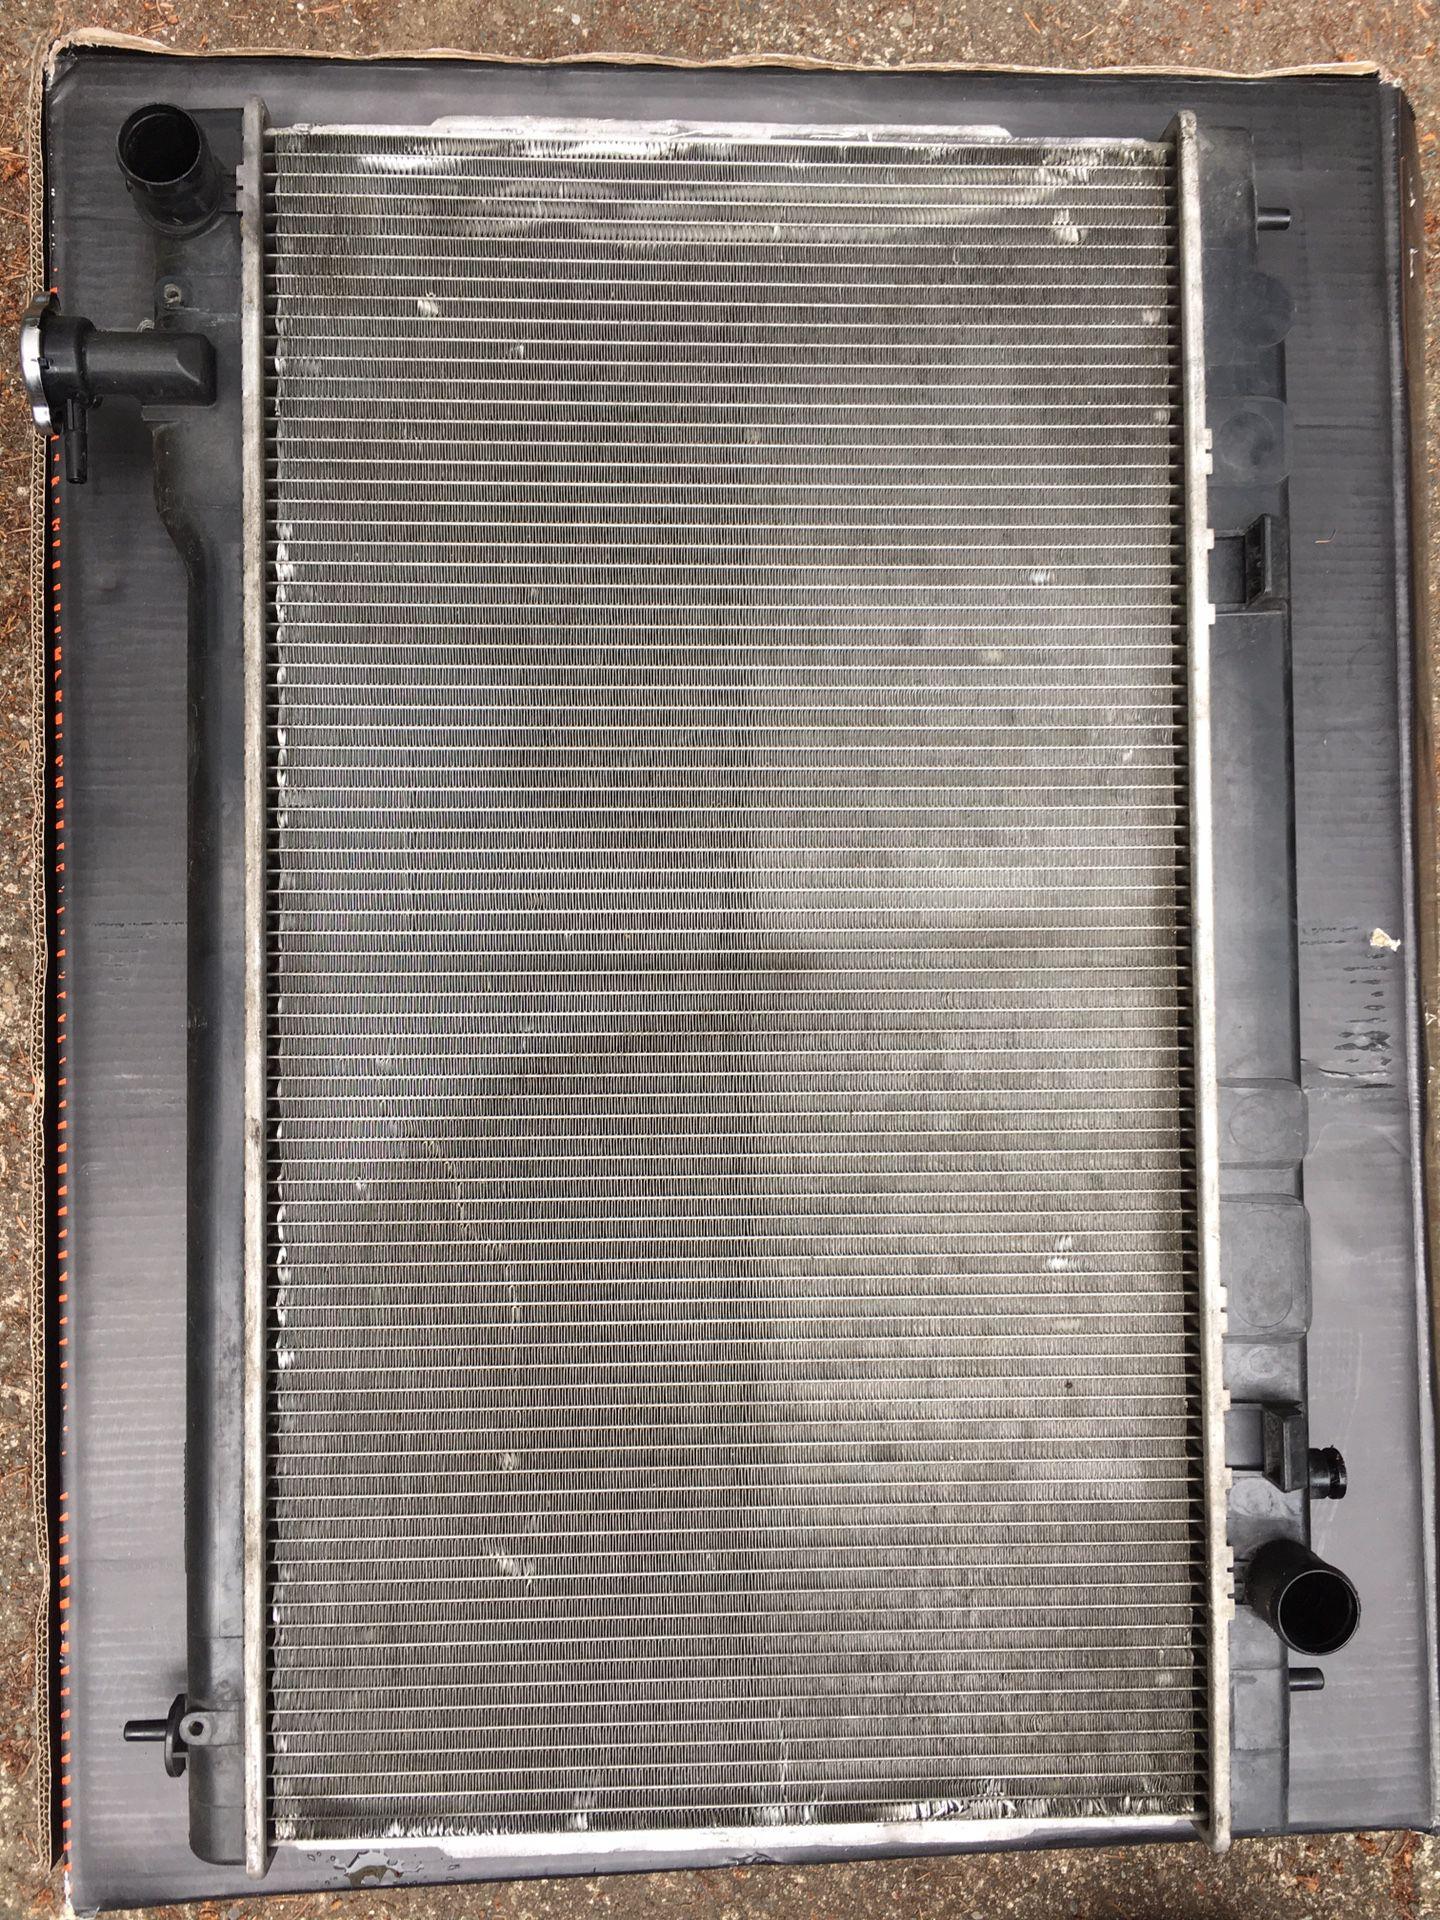 06 G35 coupe radiator